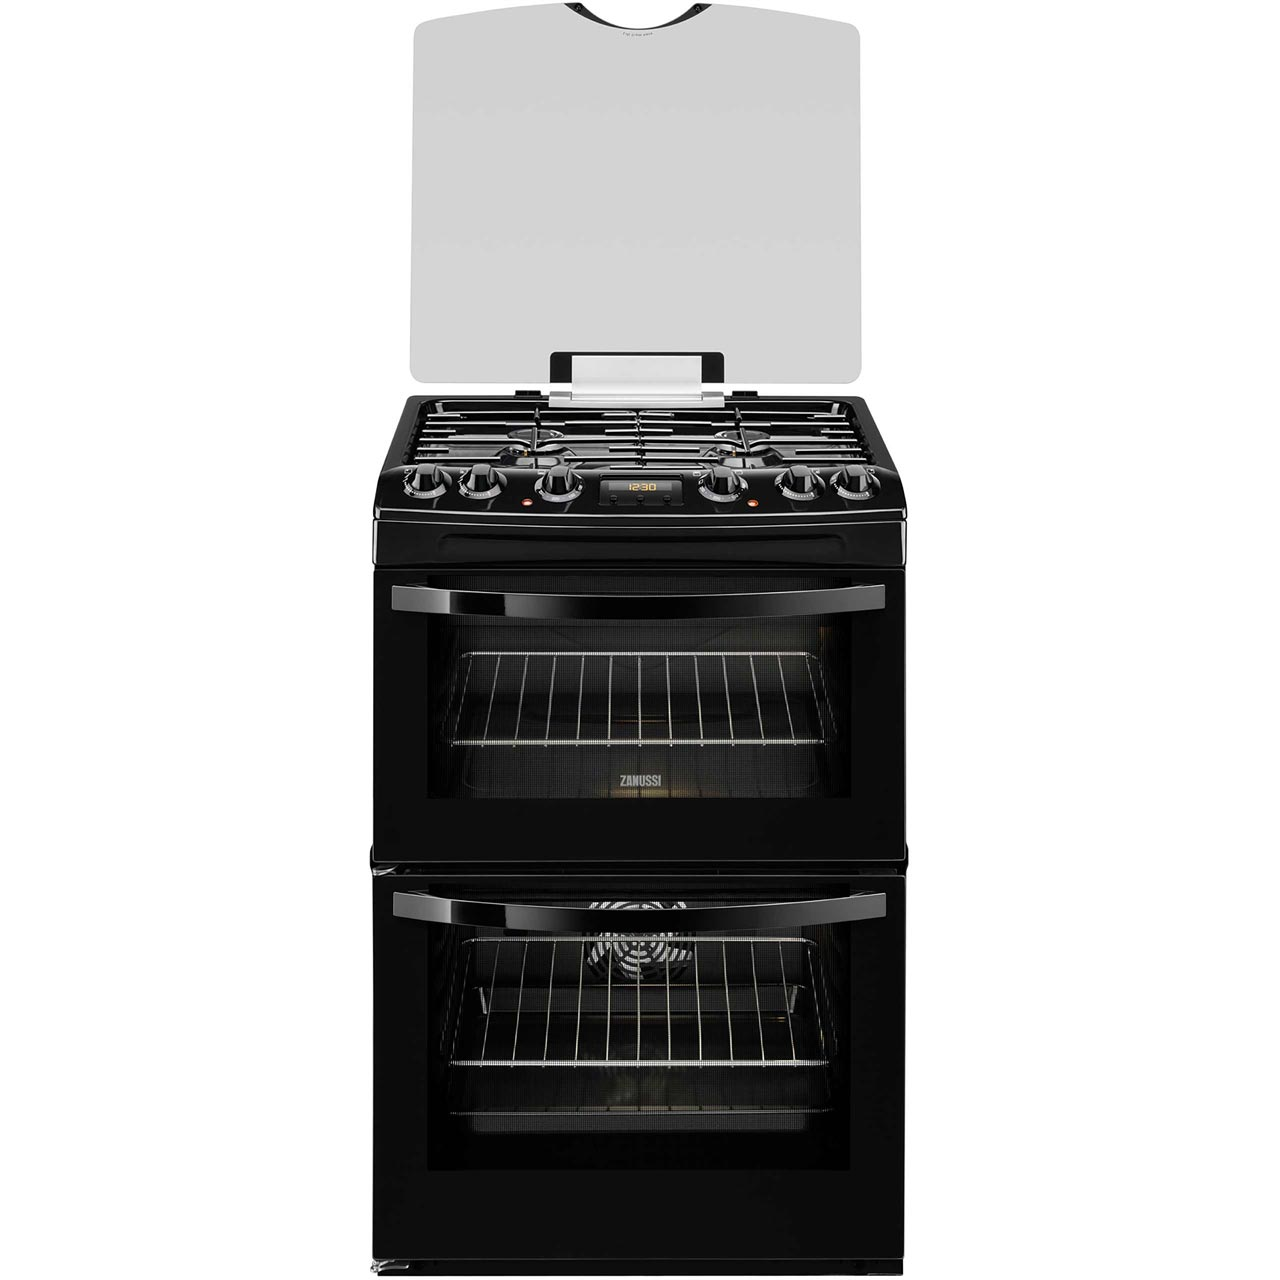 Zanussi ZCK68300B Free Standing Cooker in Black